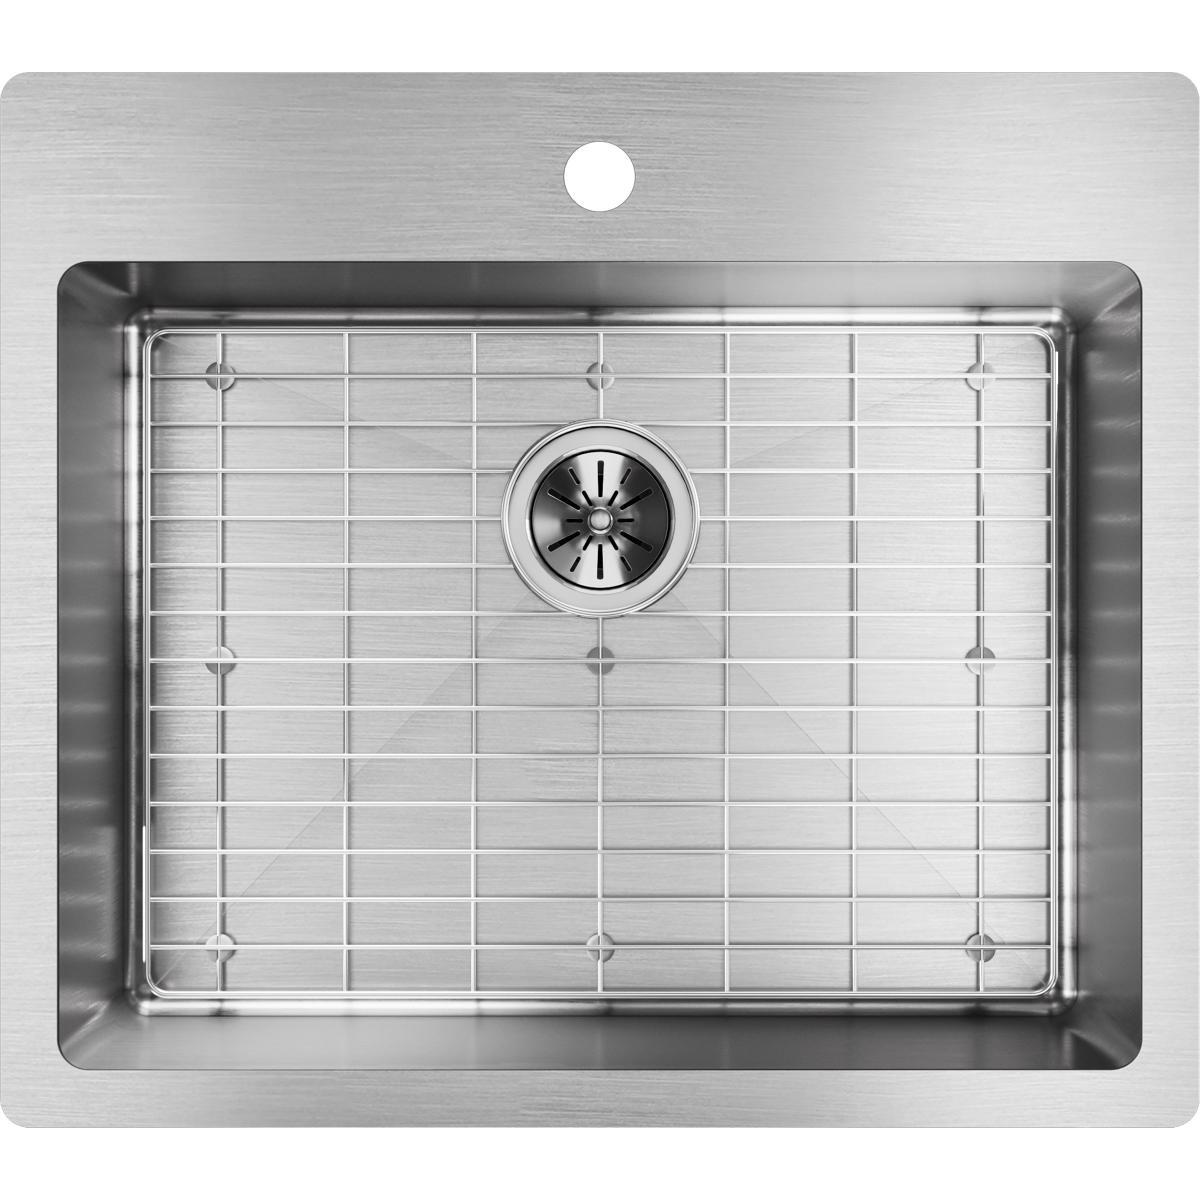 Elkay Crosstown ECTSR25229TBG1 Single Bowl Dual Mount Stainless Steel Kitchen Sink Kit